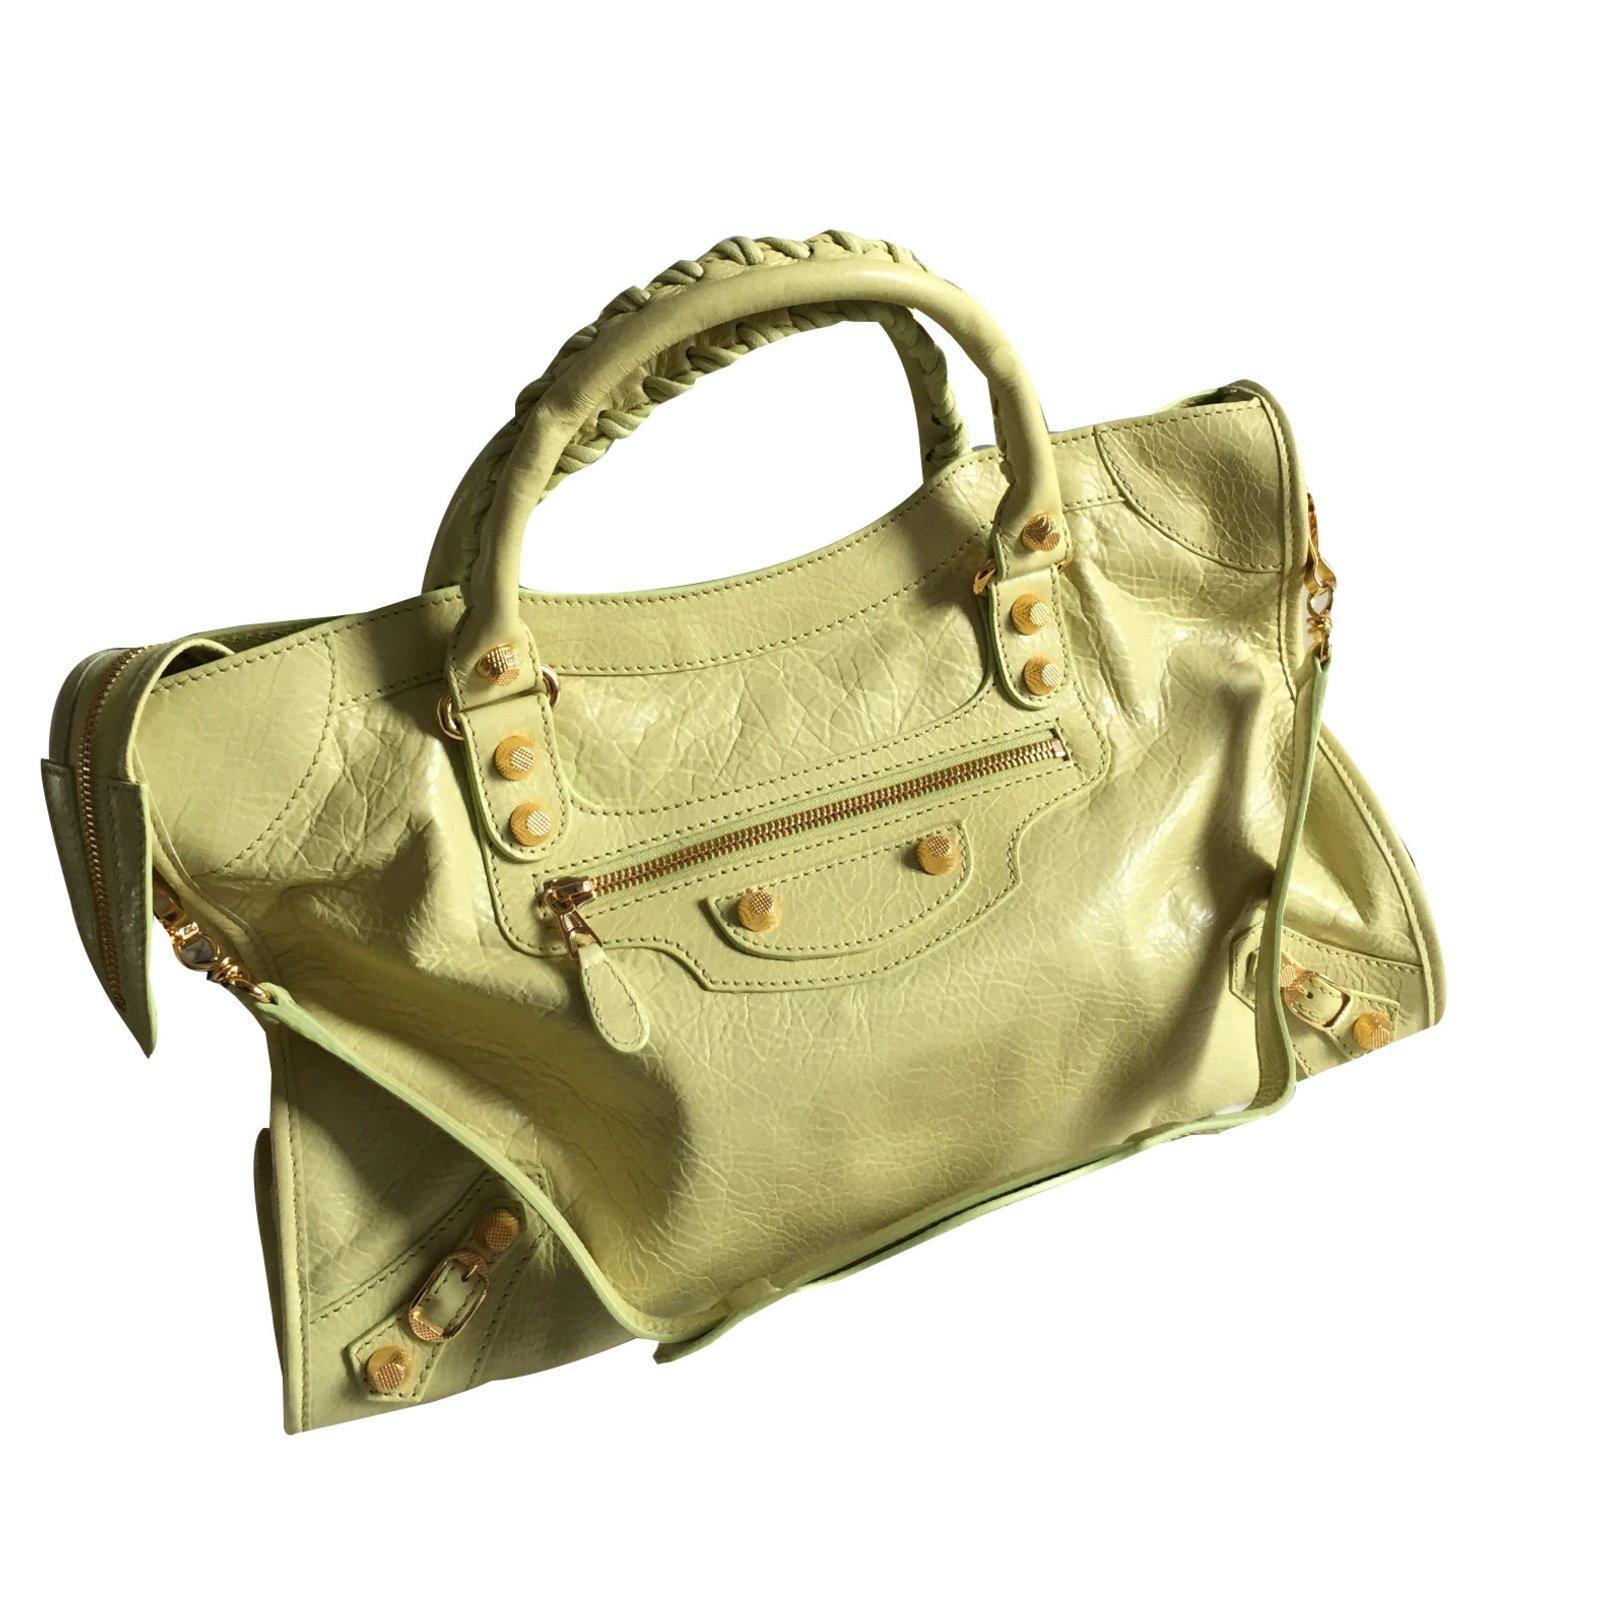 4751eff56252 Balenciaga City gold Handbags Leather Yellow ref.57199 - Joli Closet